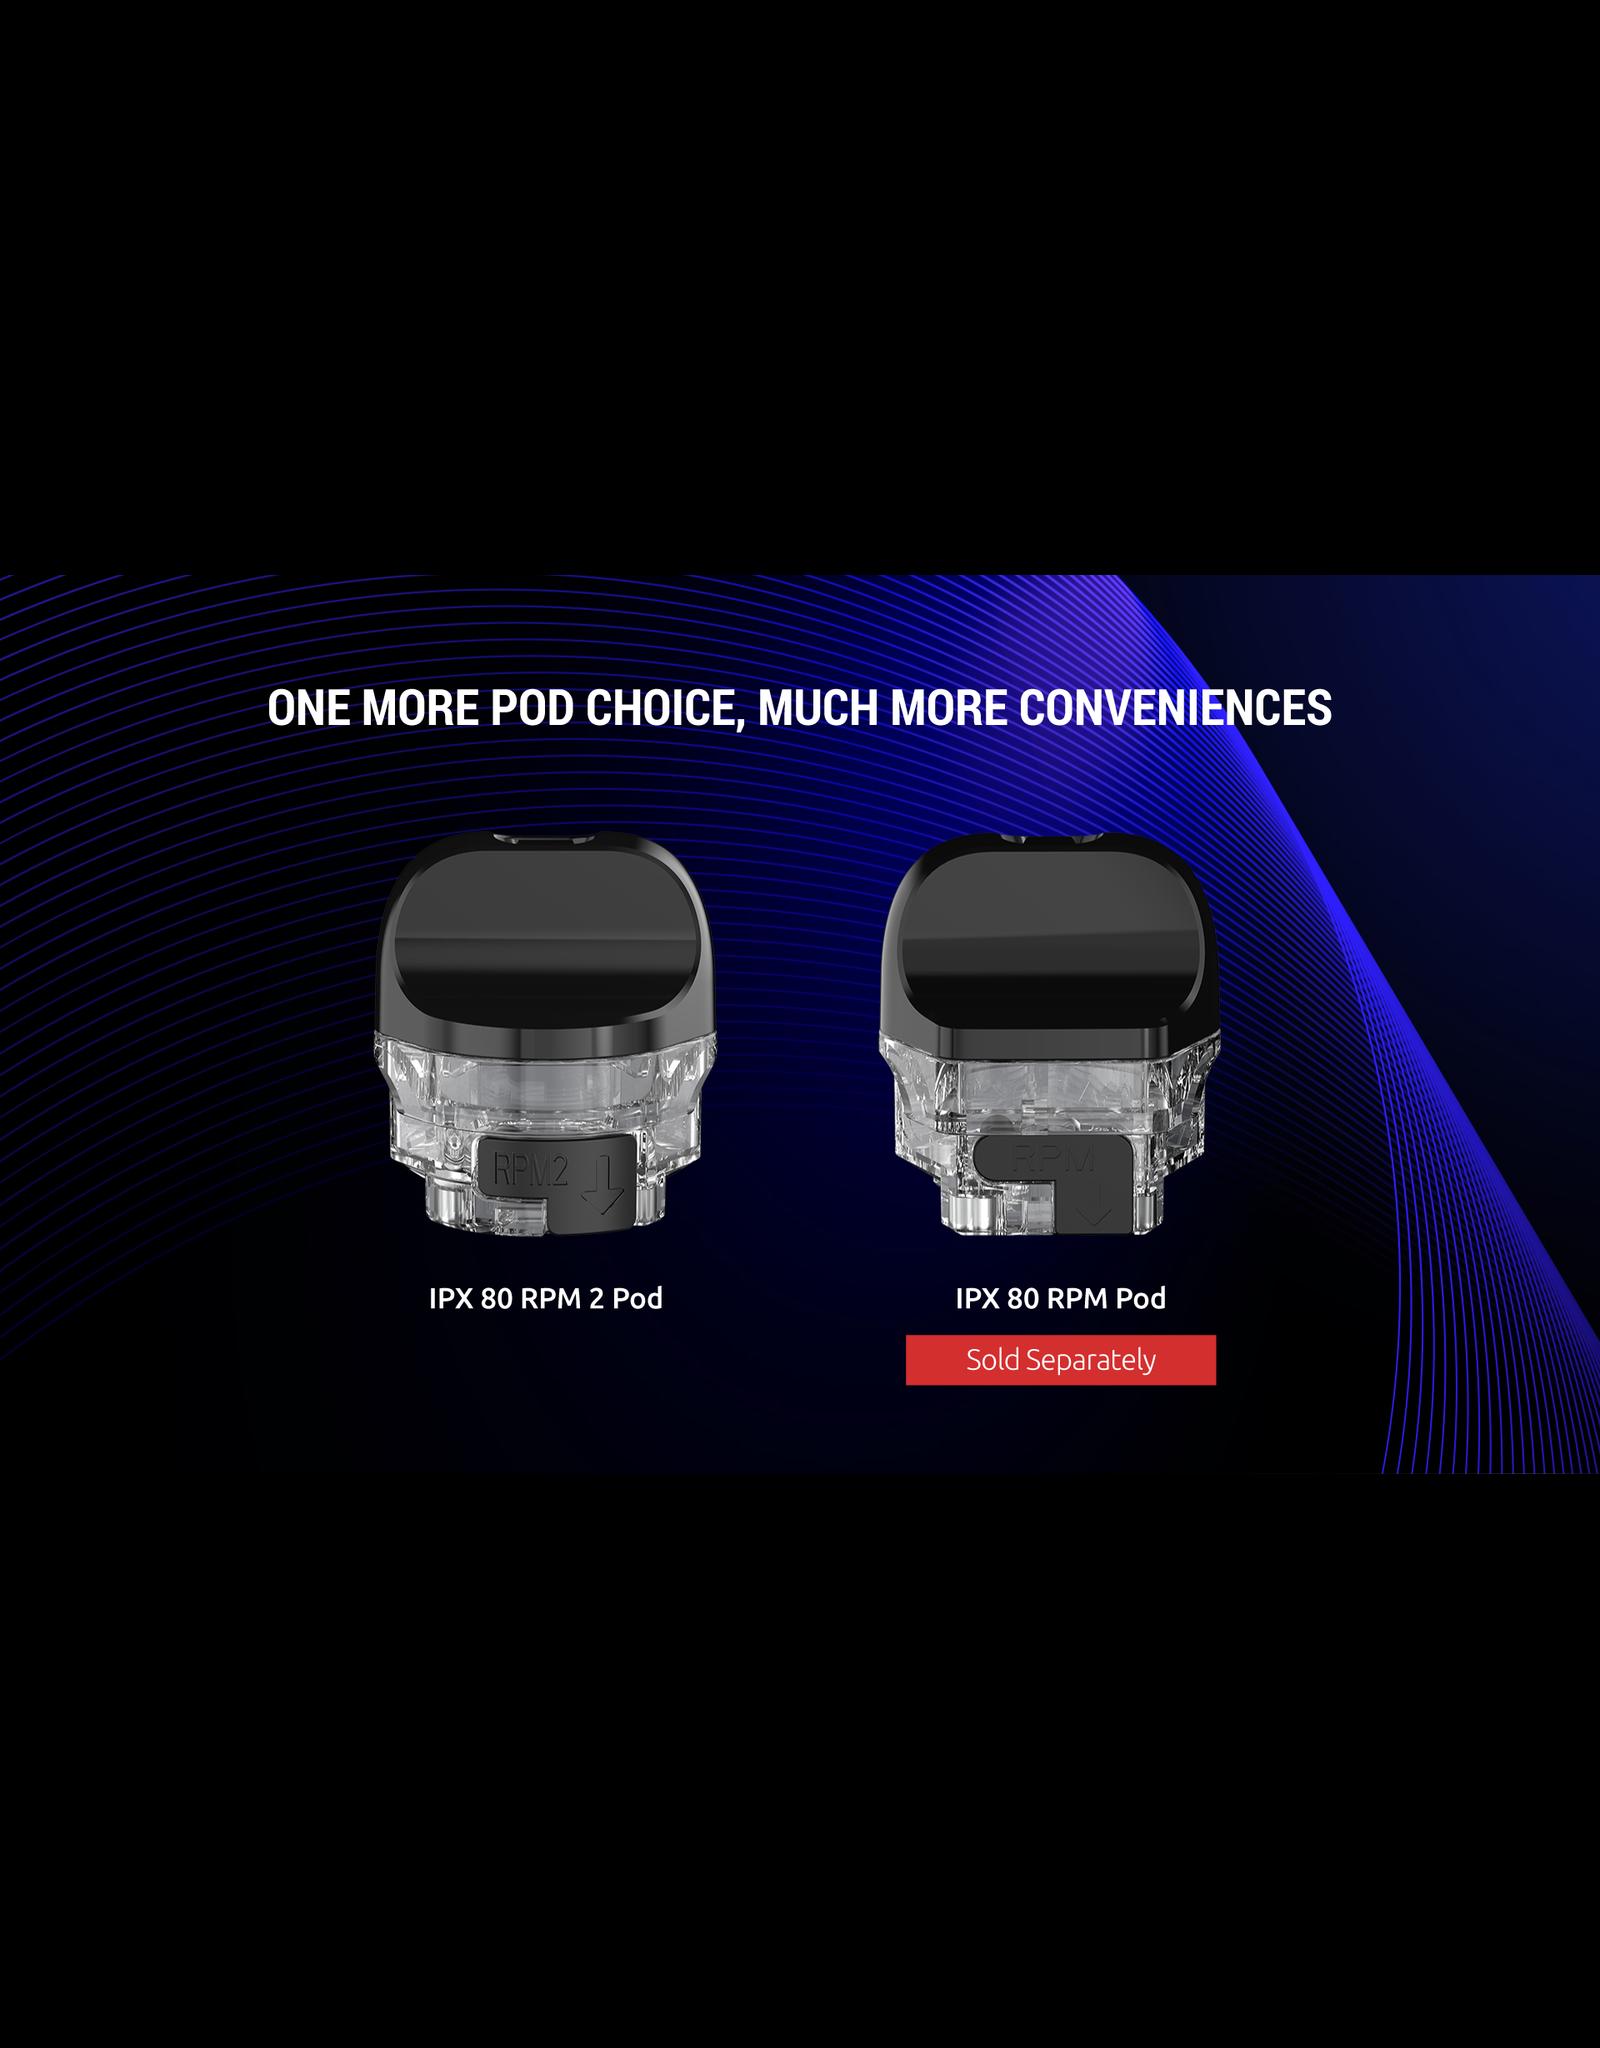 Smok Smok IPX80 RPM 2 Replacement Pods (3/Pk) [CRC]